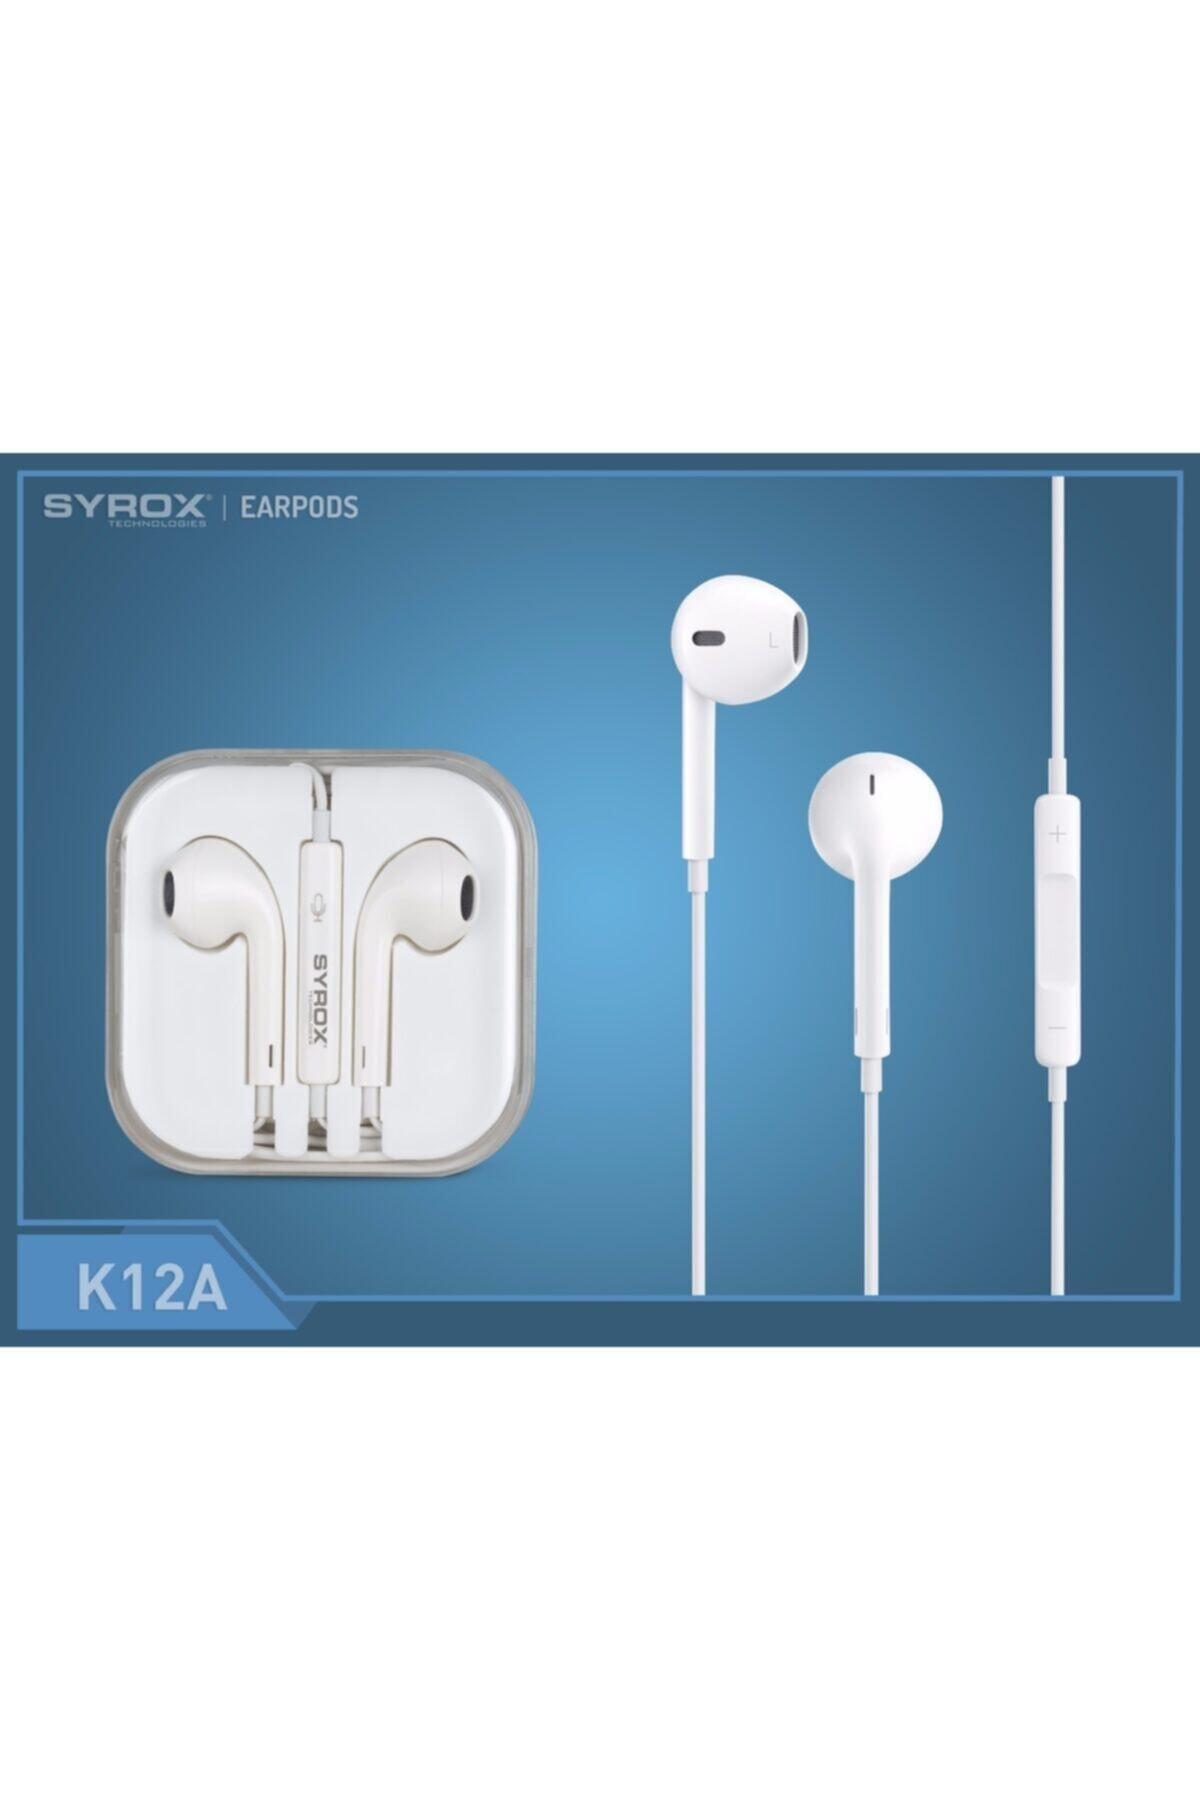 Syrox Jak Girişli Mikrofonlu Iphone Kulaklık K12a K12a 3.5 Mm